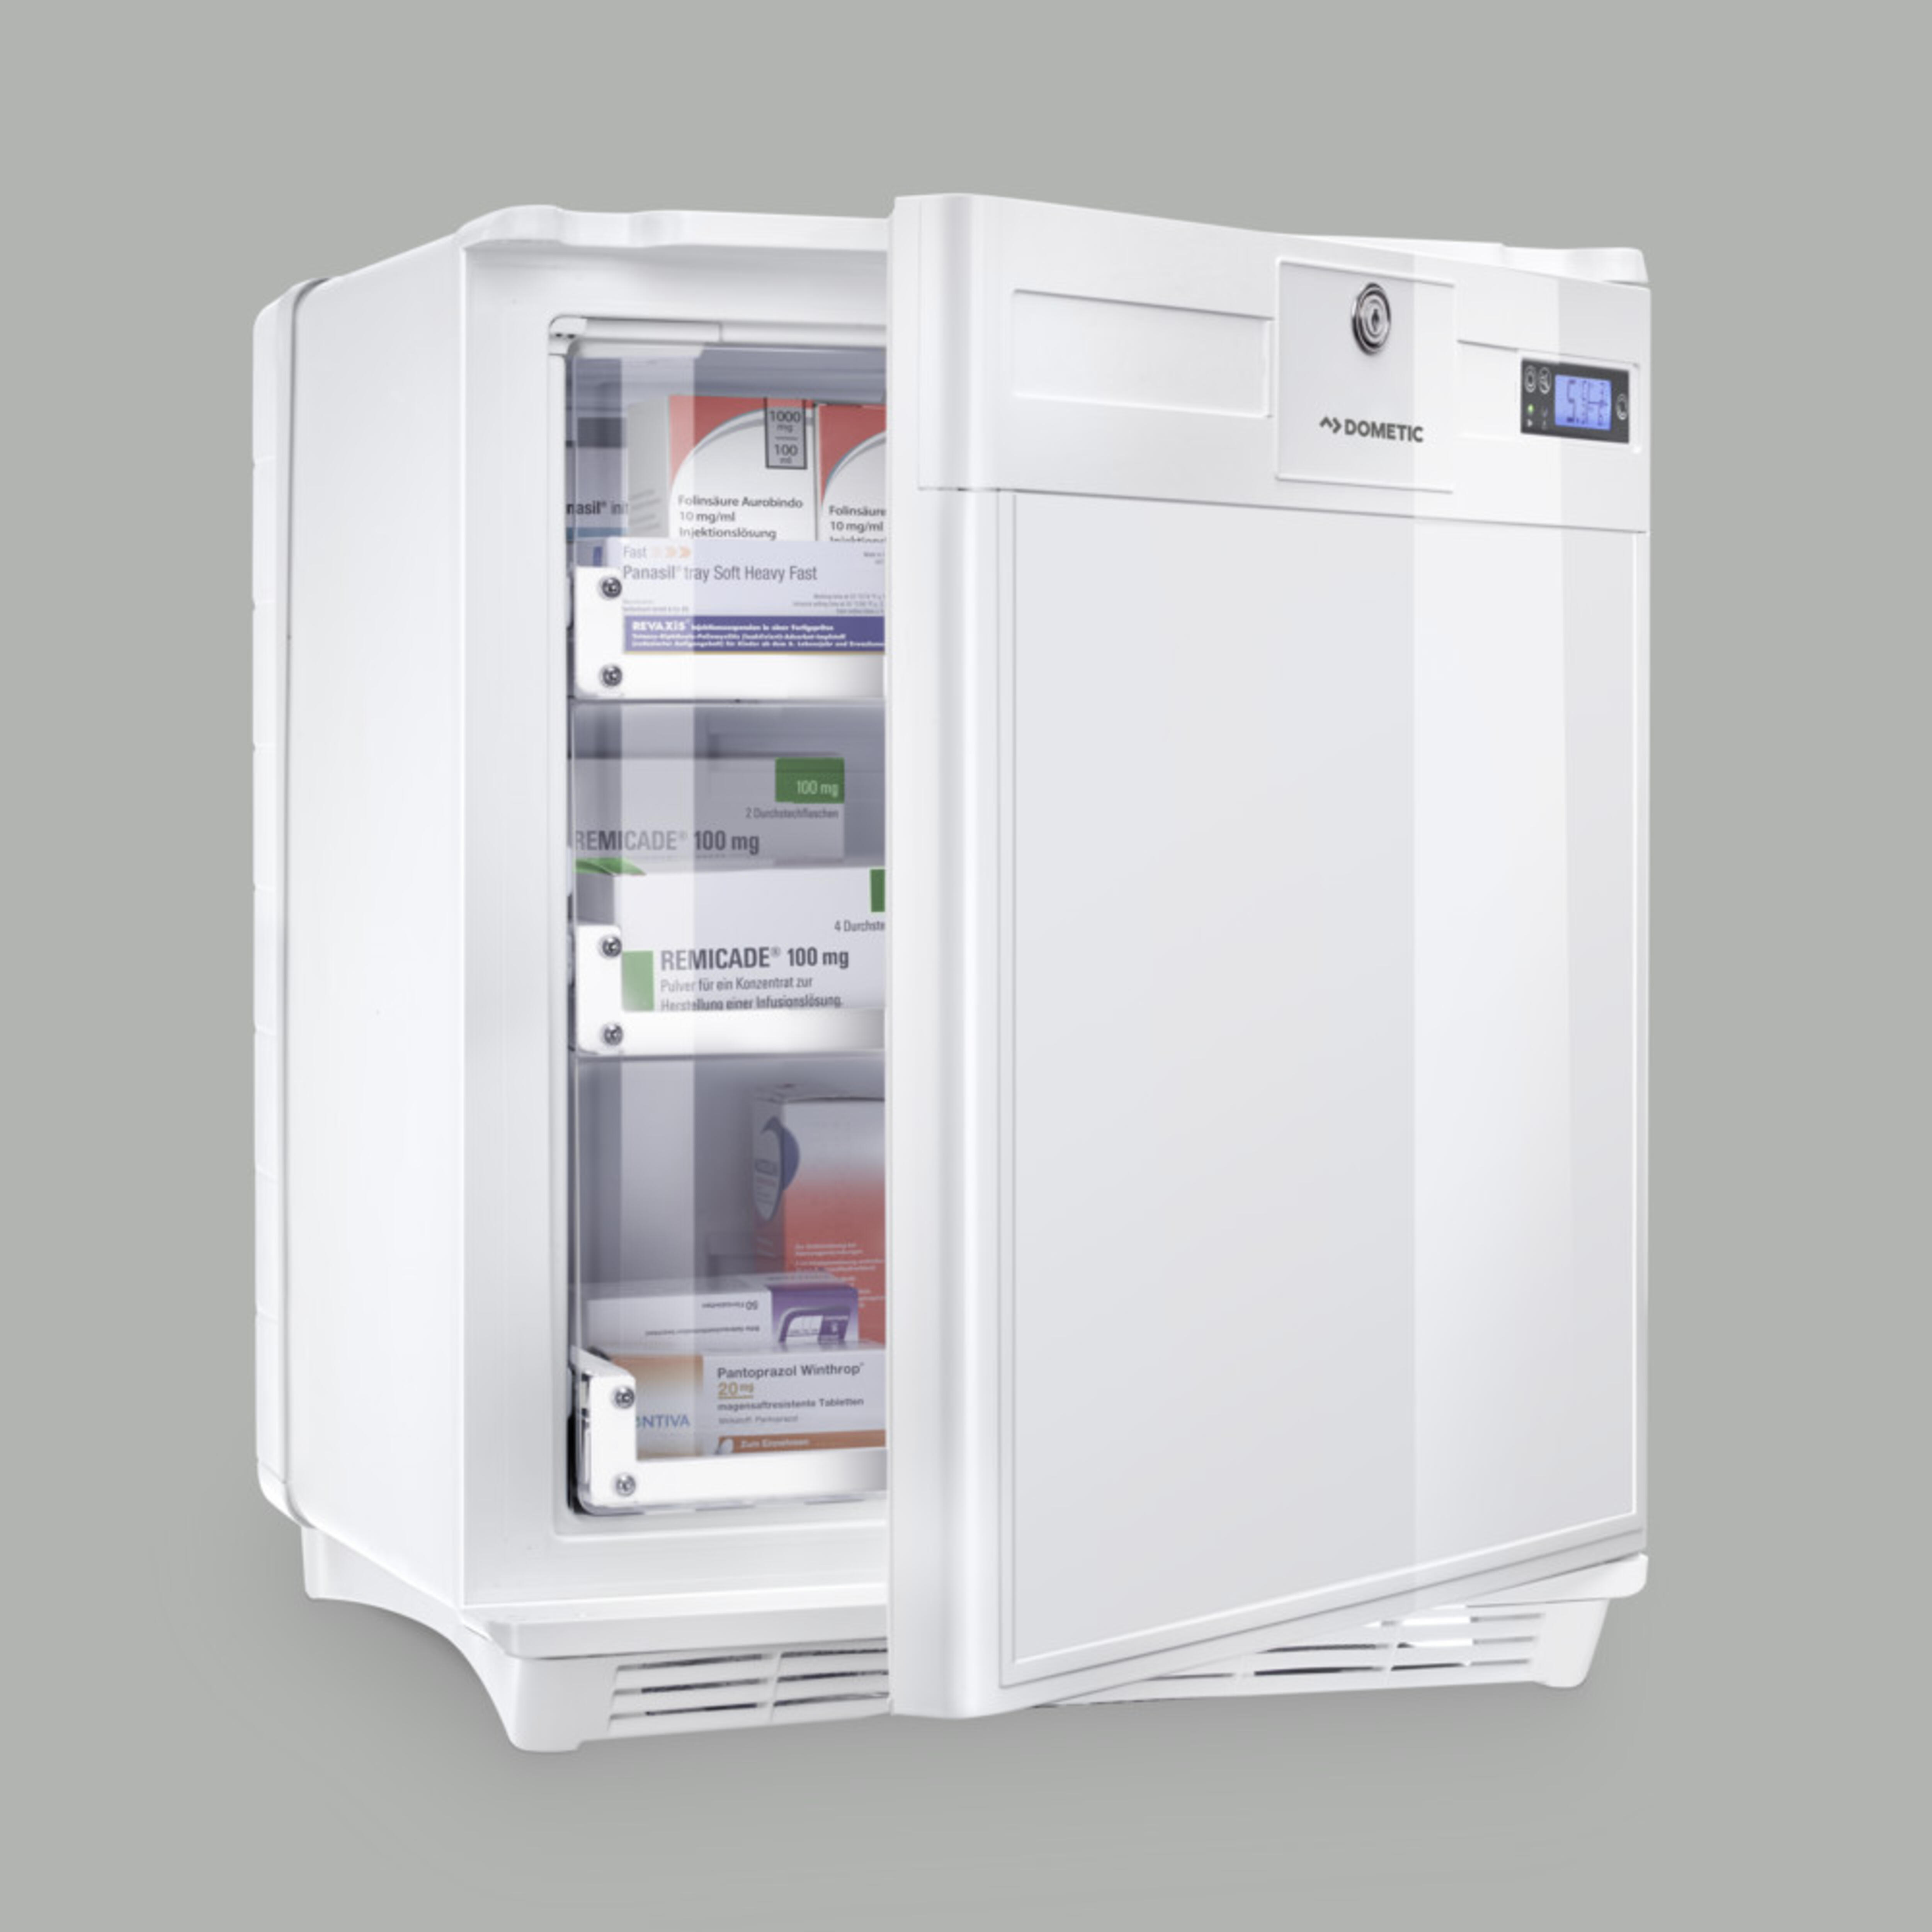 Dometic HC 502D